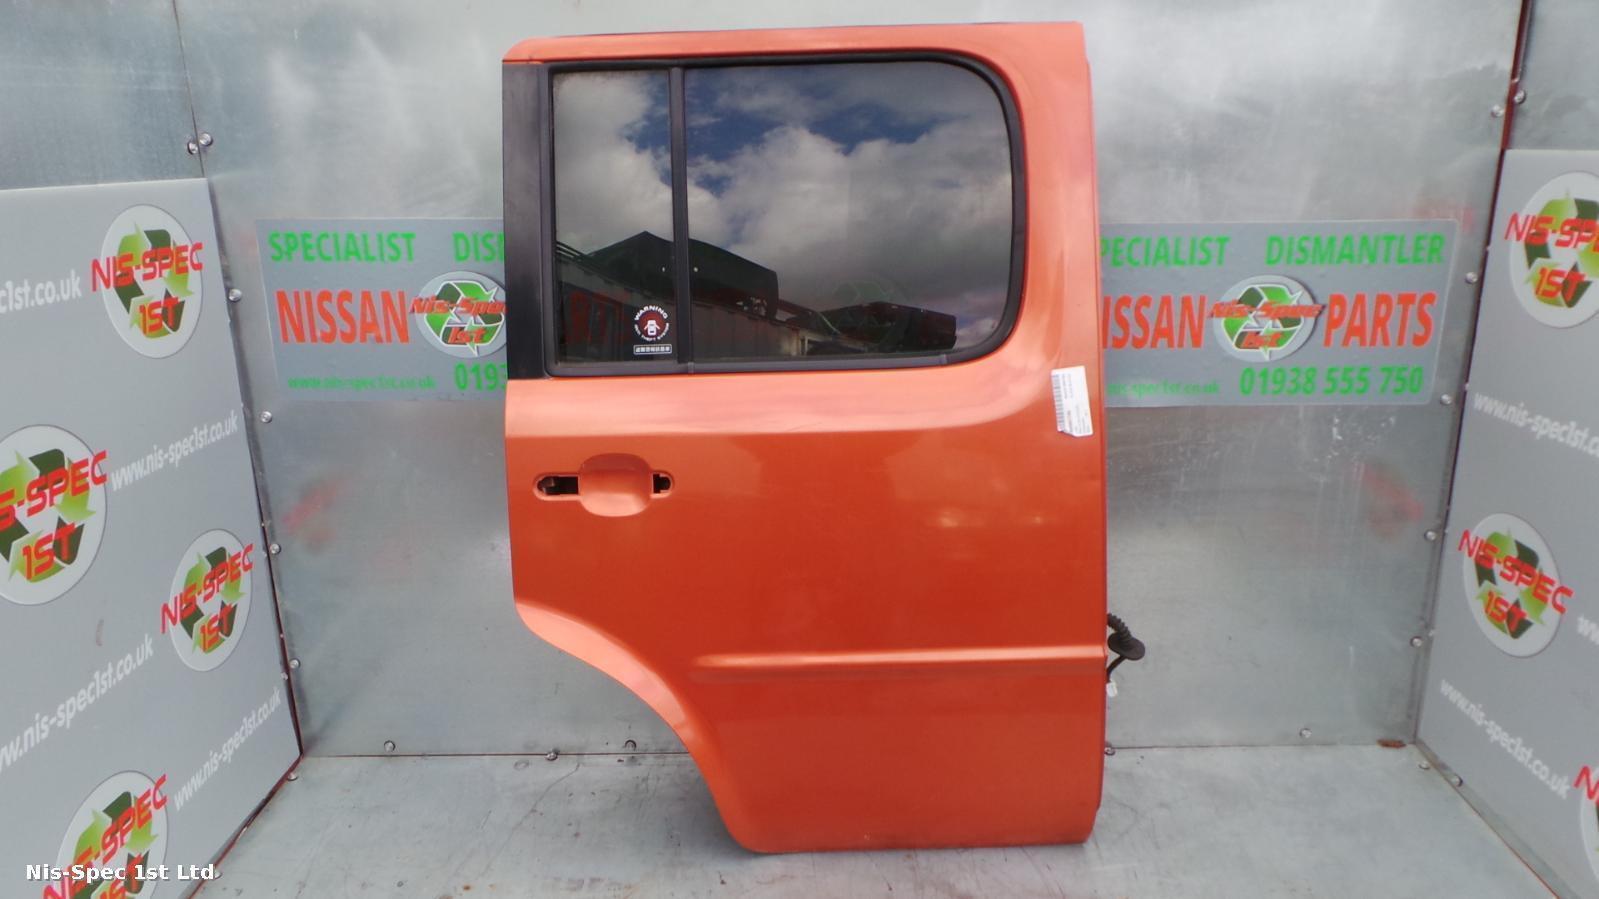 Nissan Cube 02 - 08 Driver Side Rear Bare Door